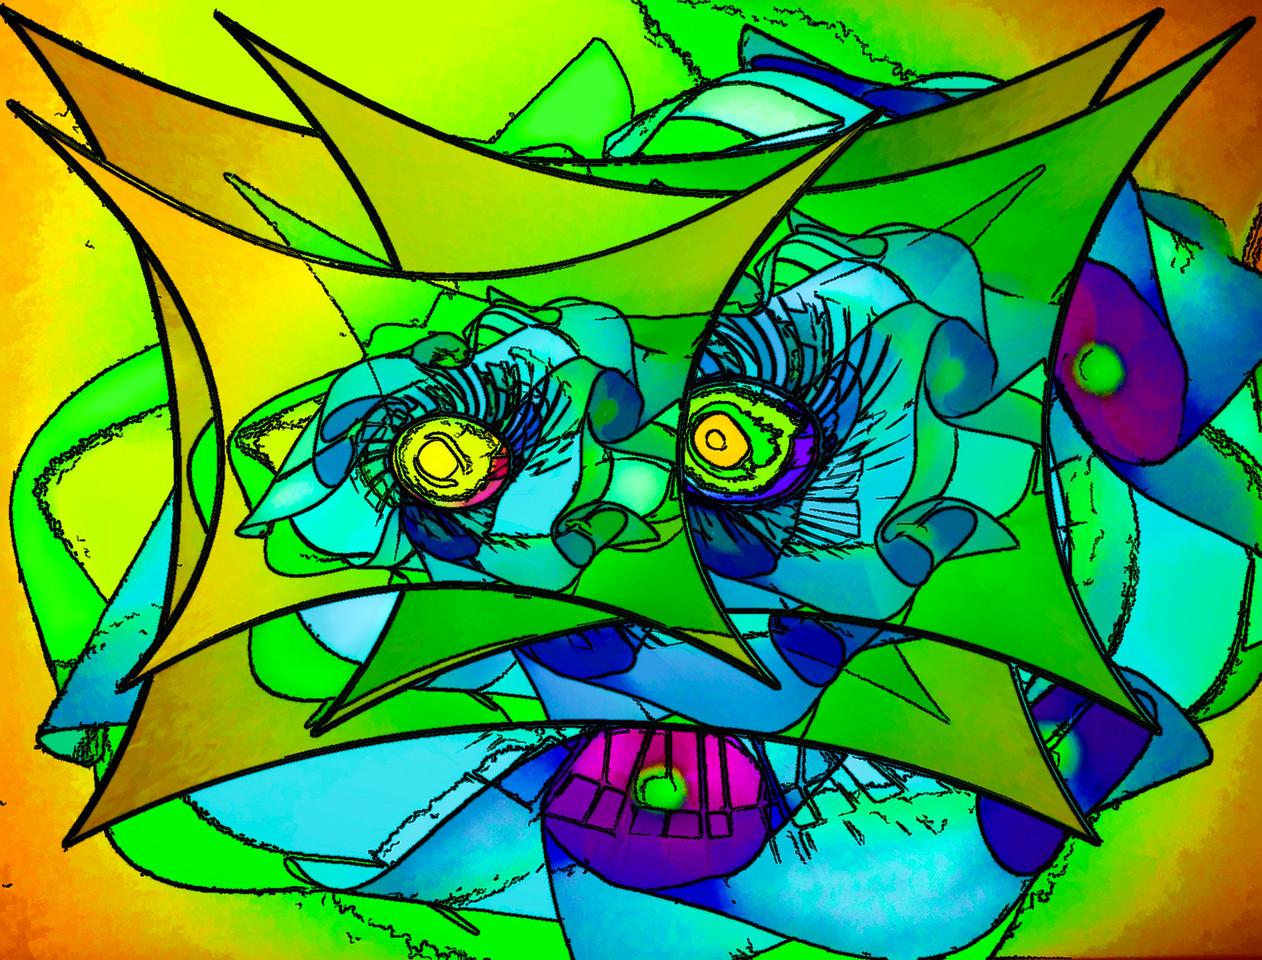 Paper Flower on Glass SQ sq-2